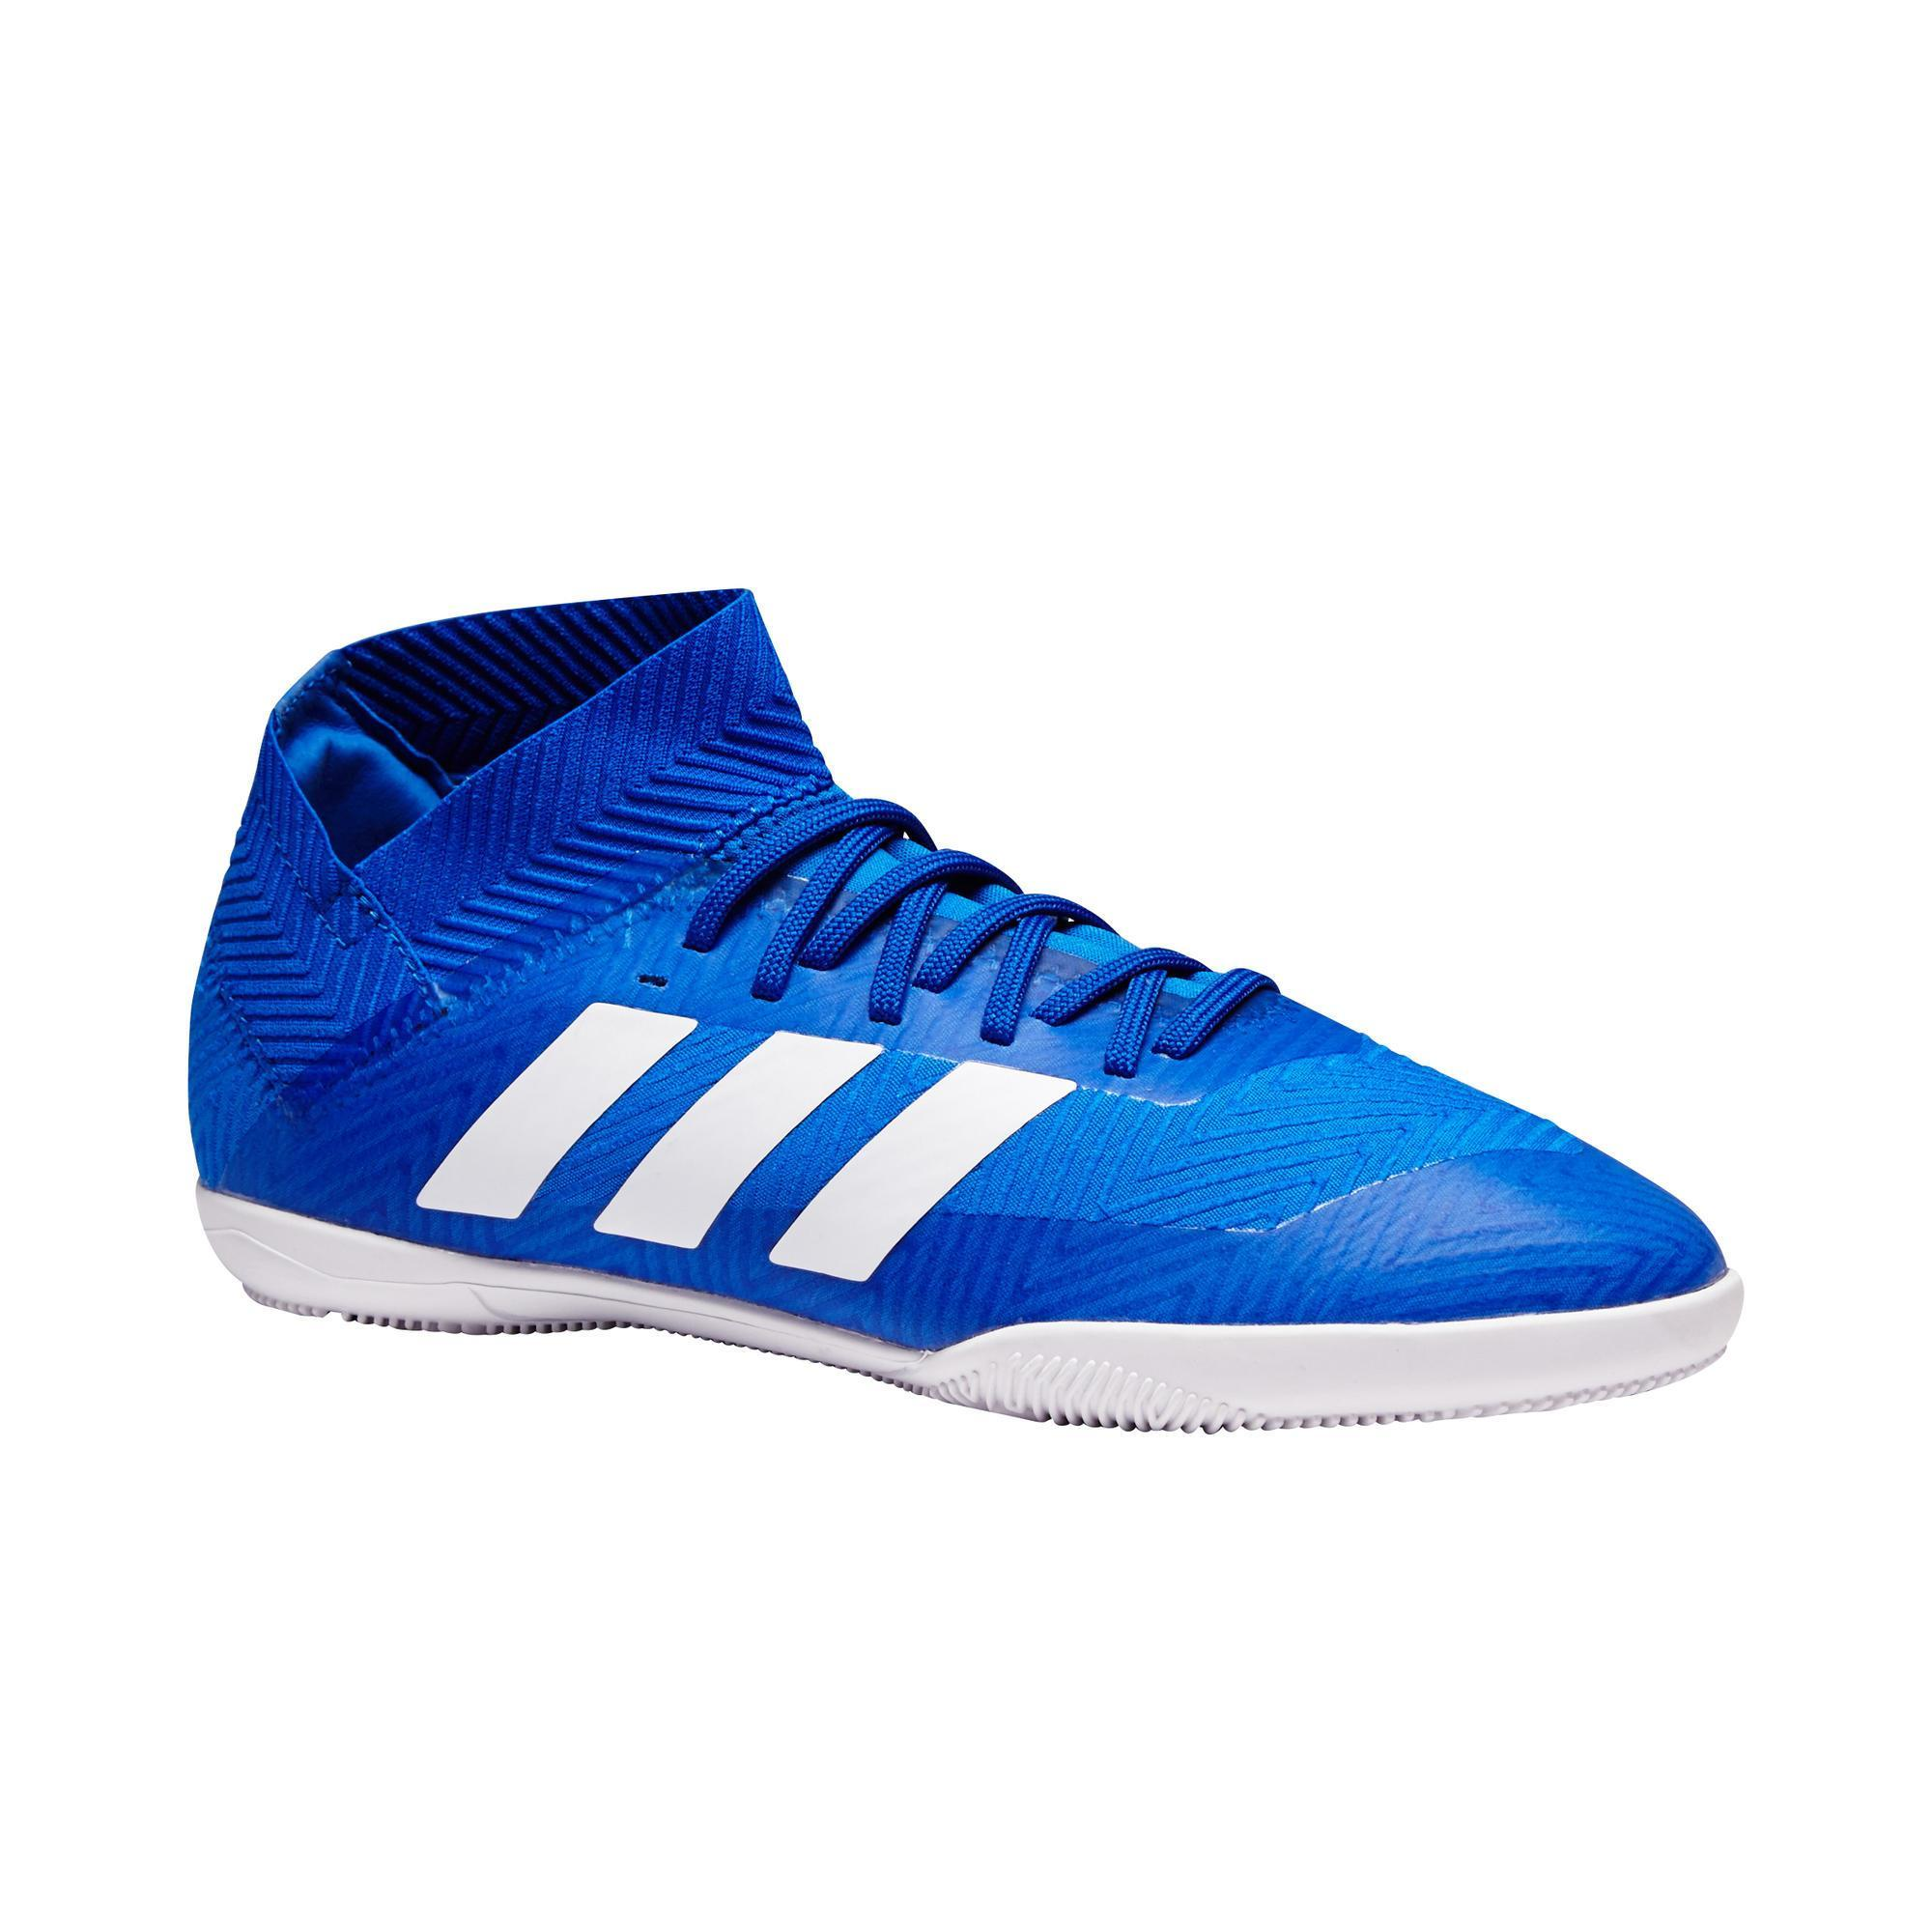 Adidas Zaalvoetbalschoenen kind Nemeziz Tango 18.3 sala blauw/wit